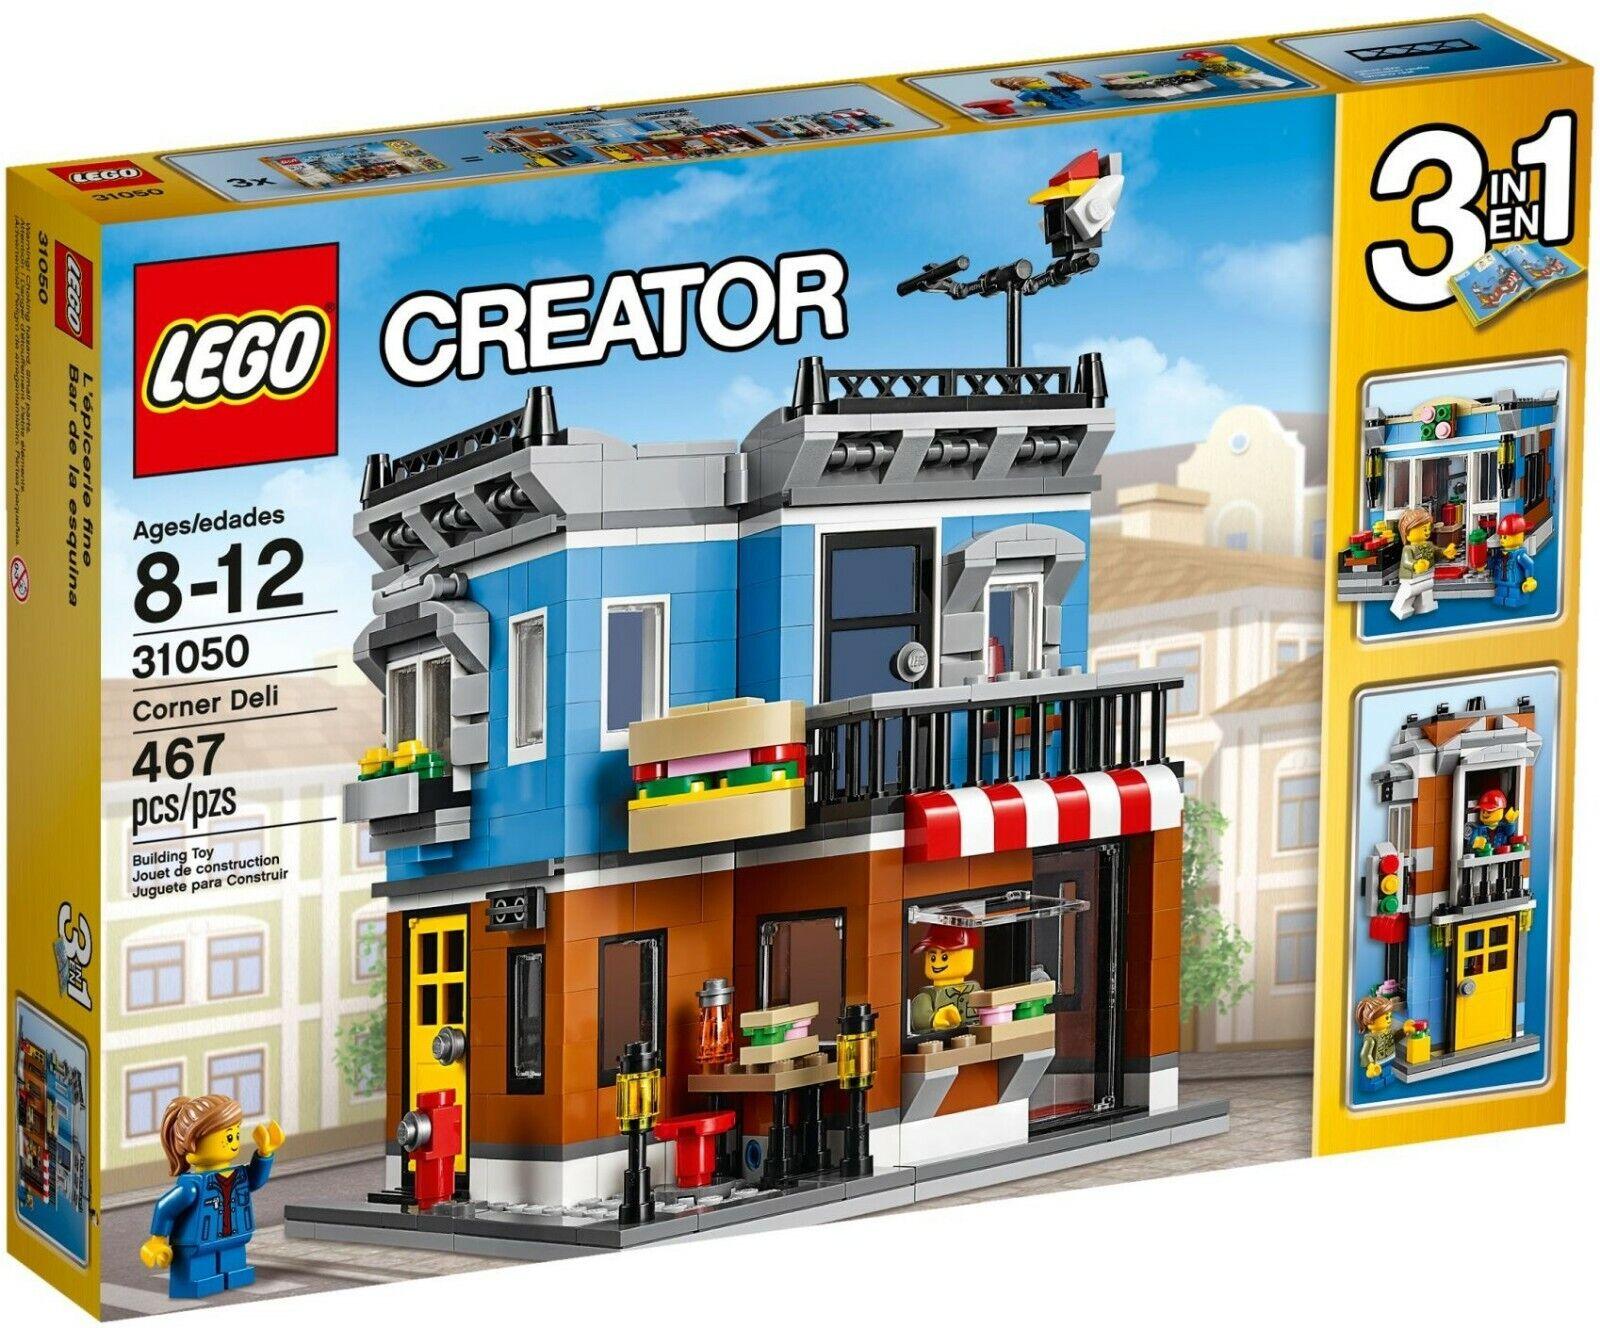 Lego Creator 3in1 esquina Deli ( 31050) (retirado 2016) (muy rara)